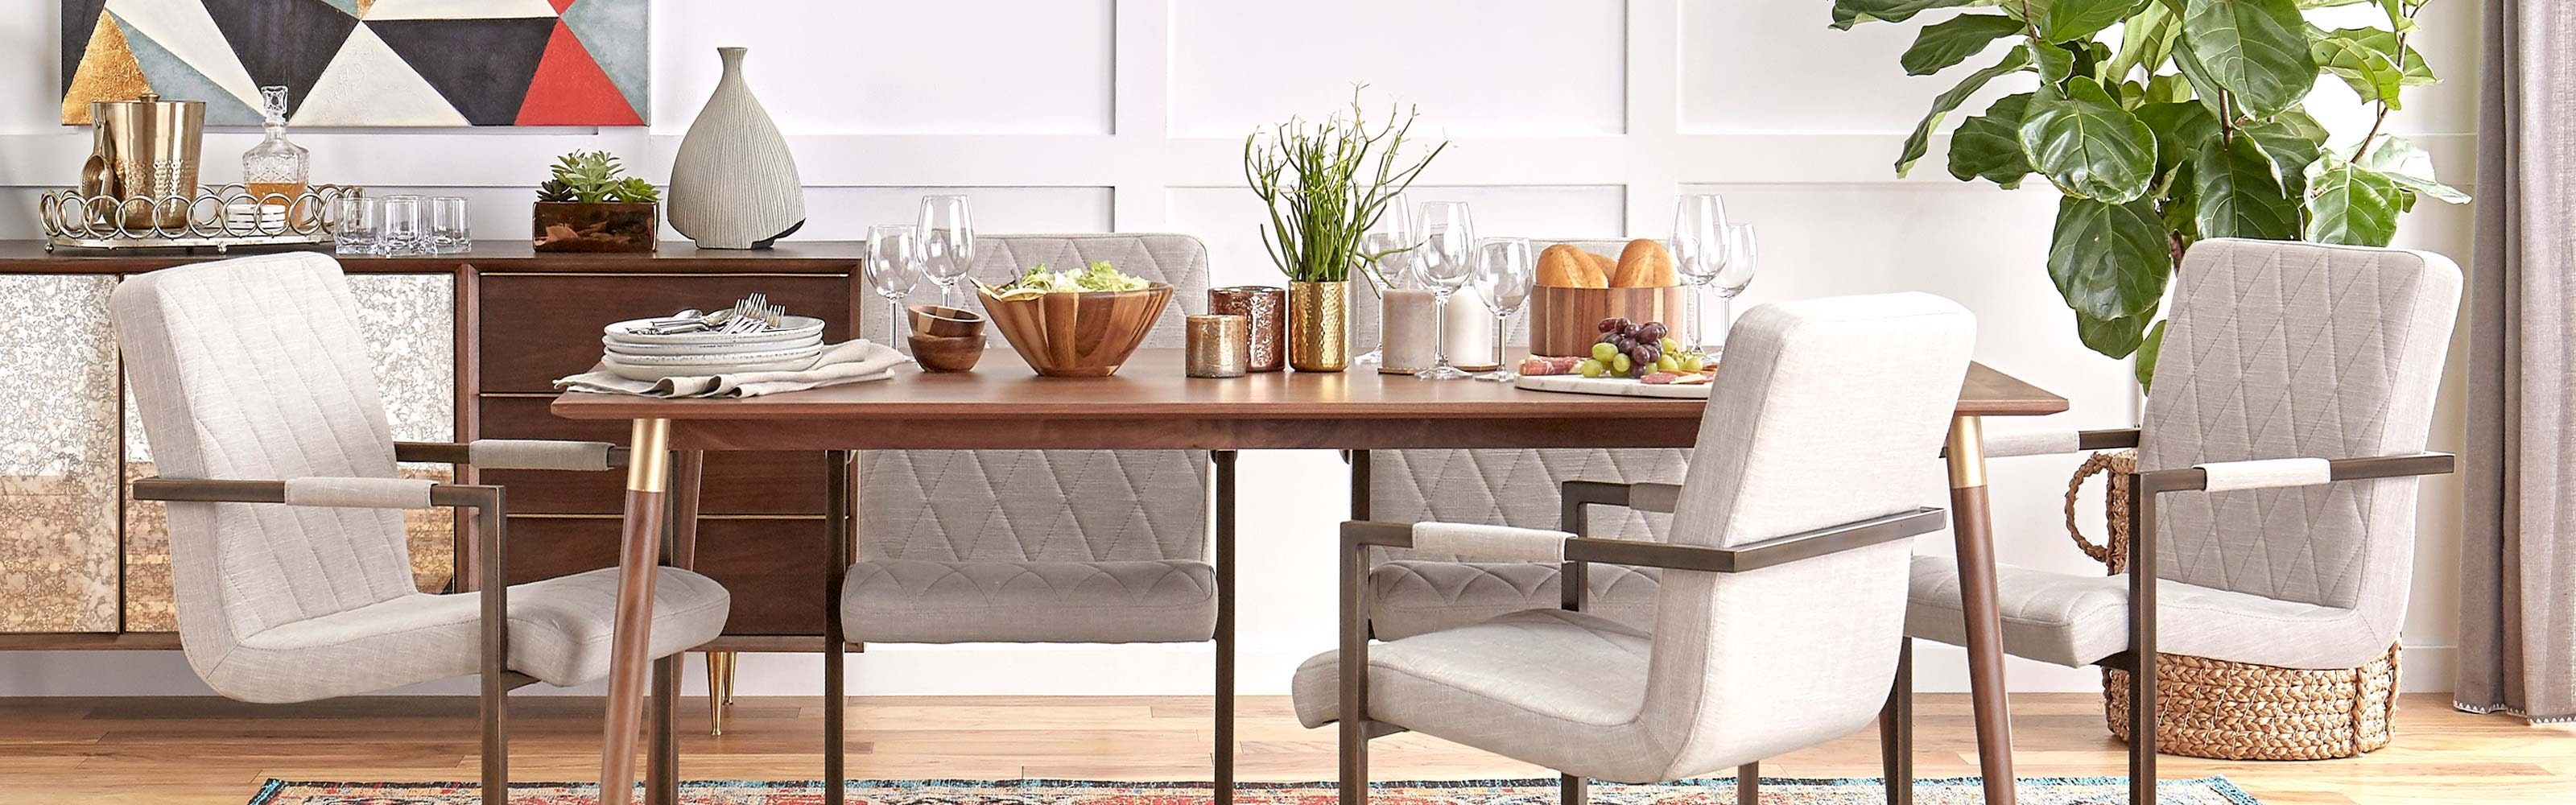 Mid Century Modern Dining Room Tables Sets Joybird